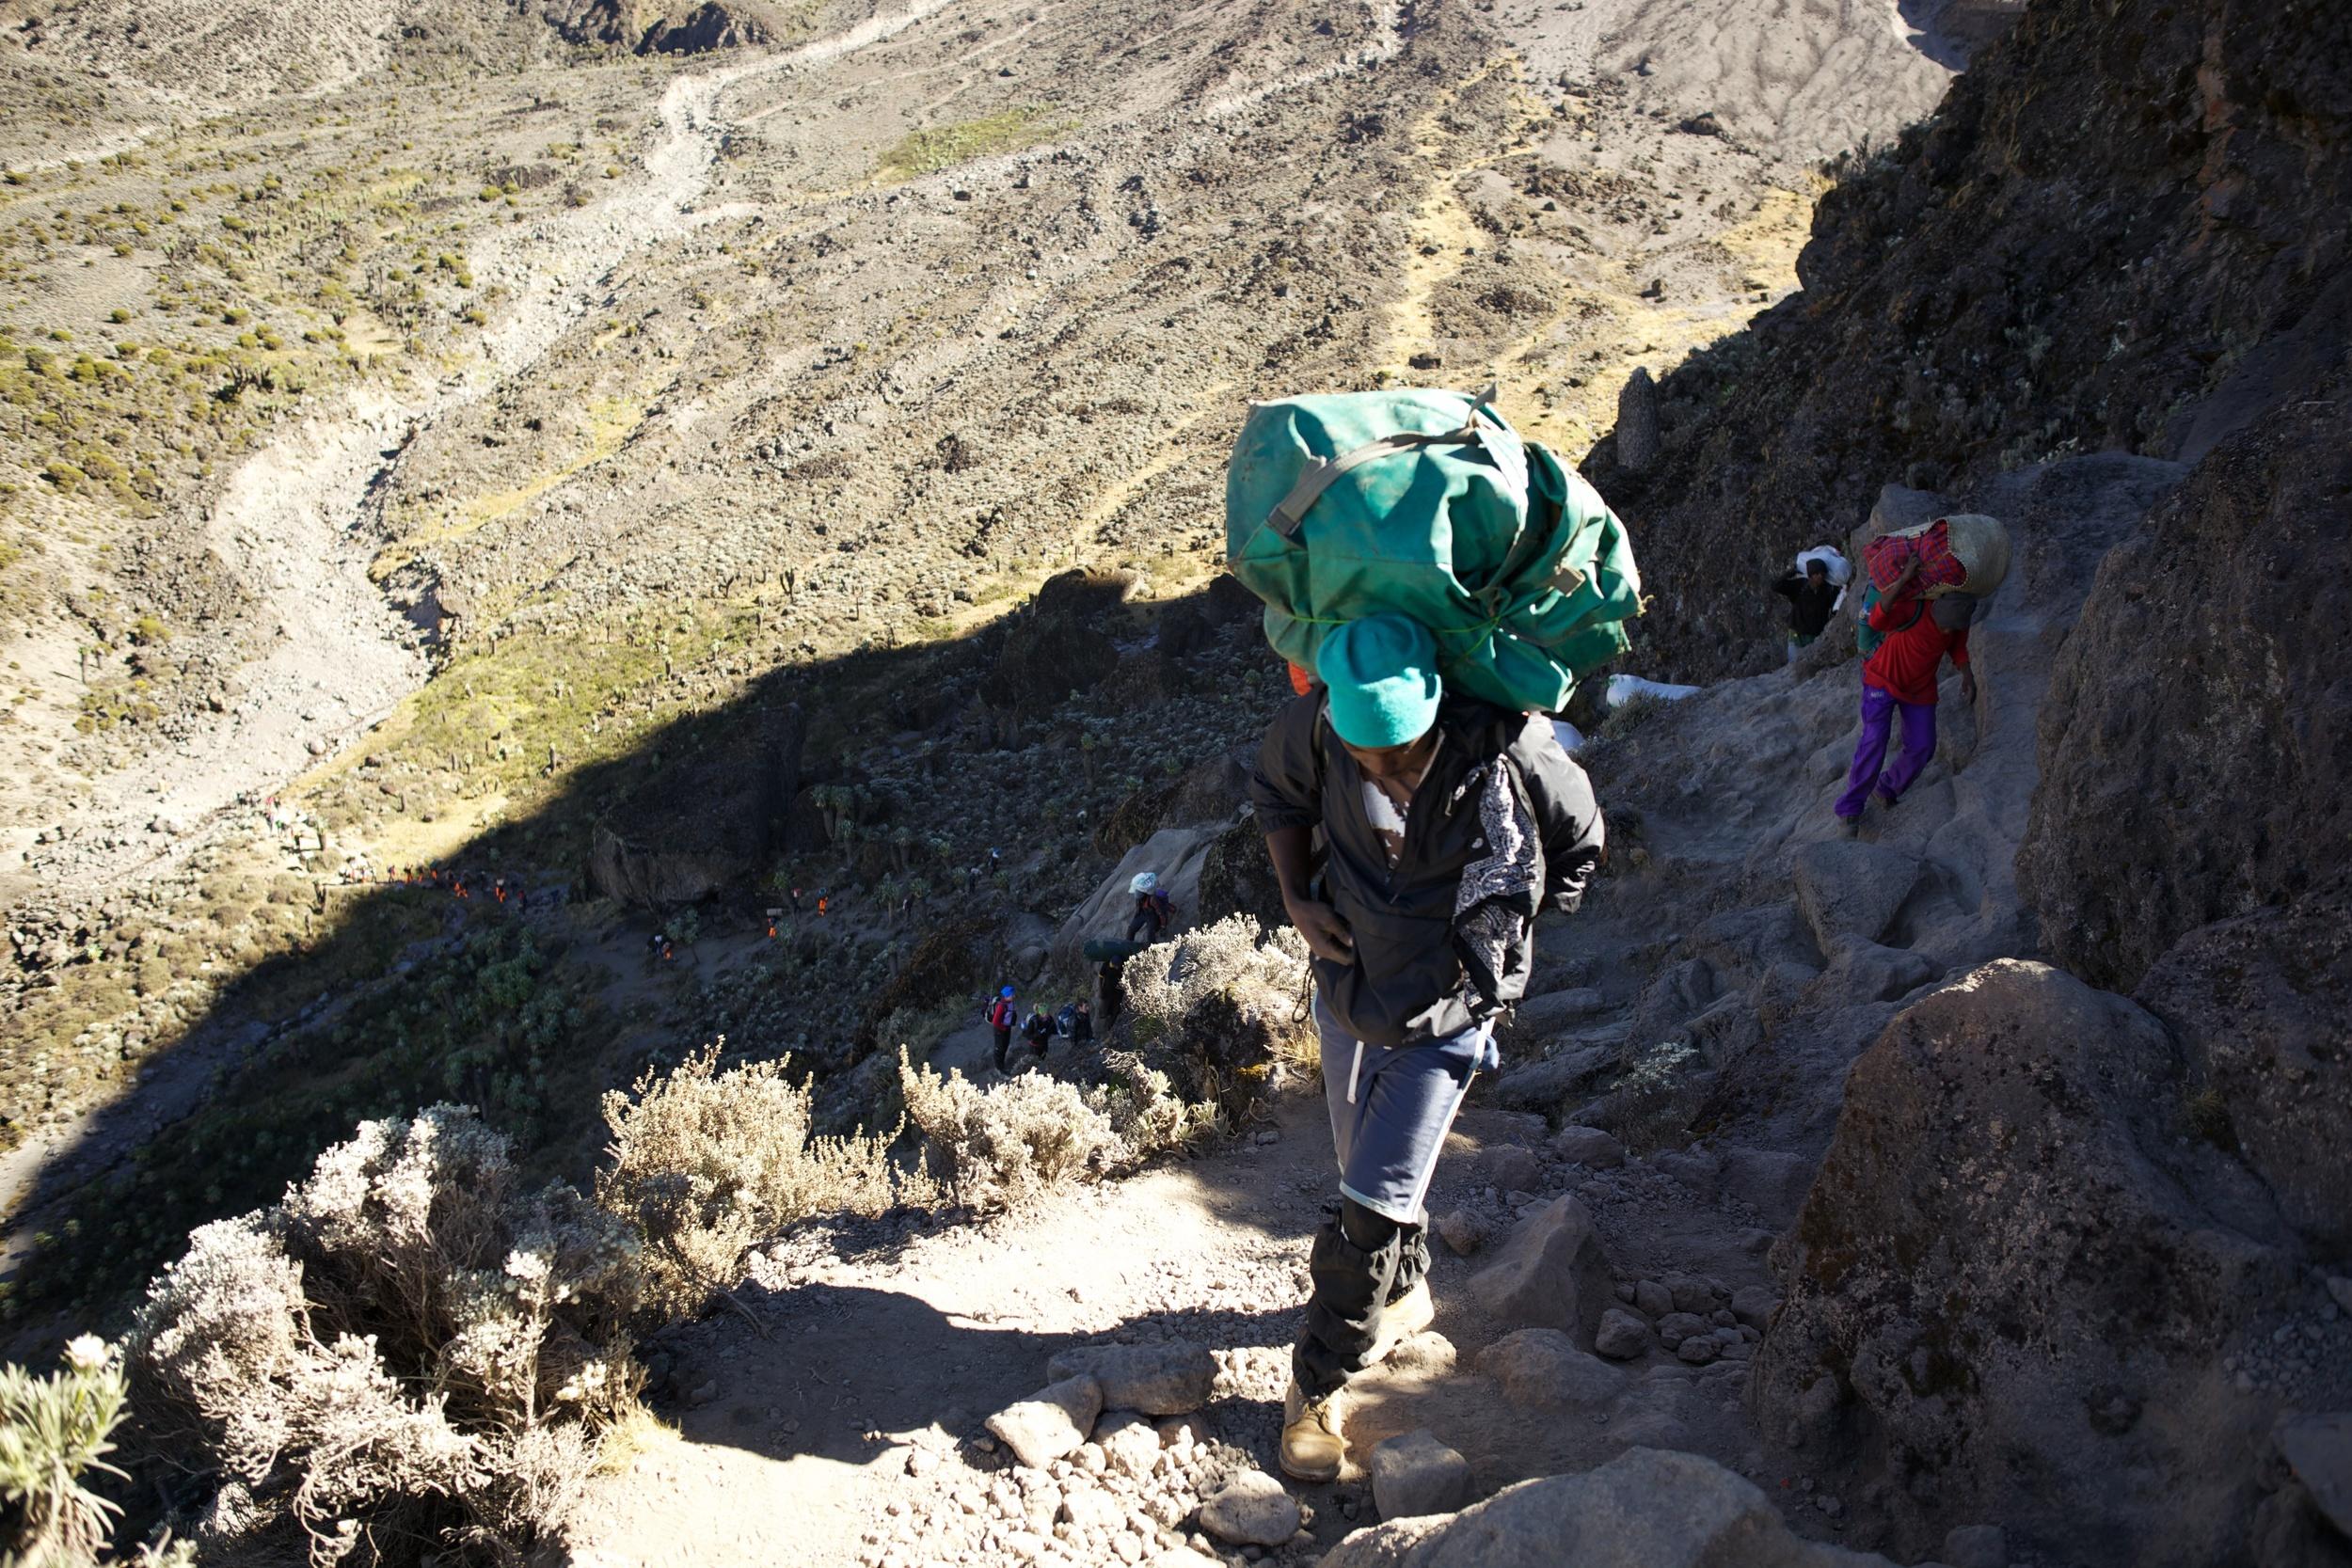 Whisky Road, Mt. Kilimanjaro (TZ)